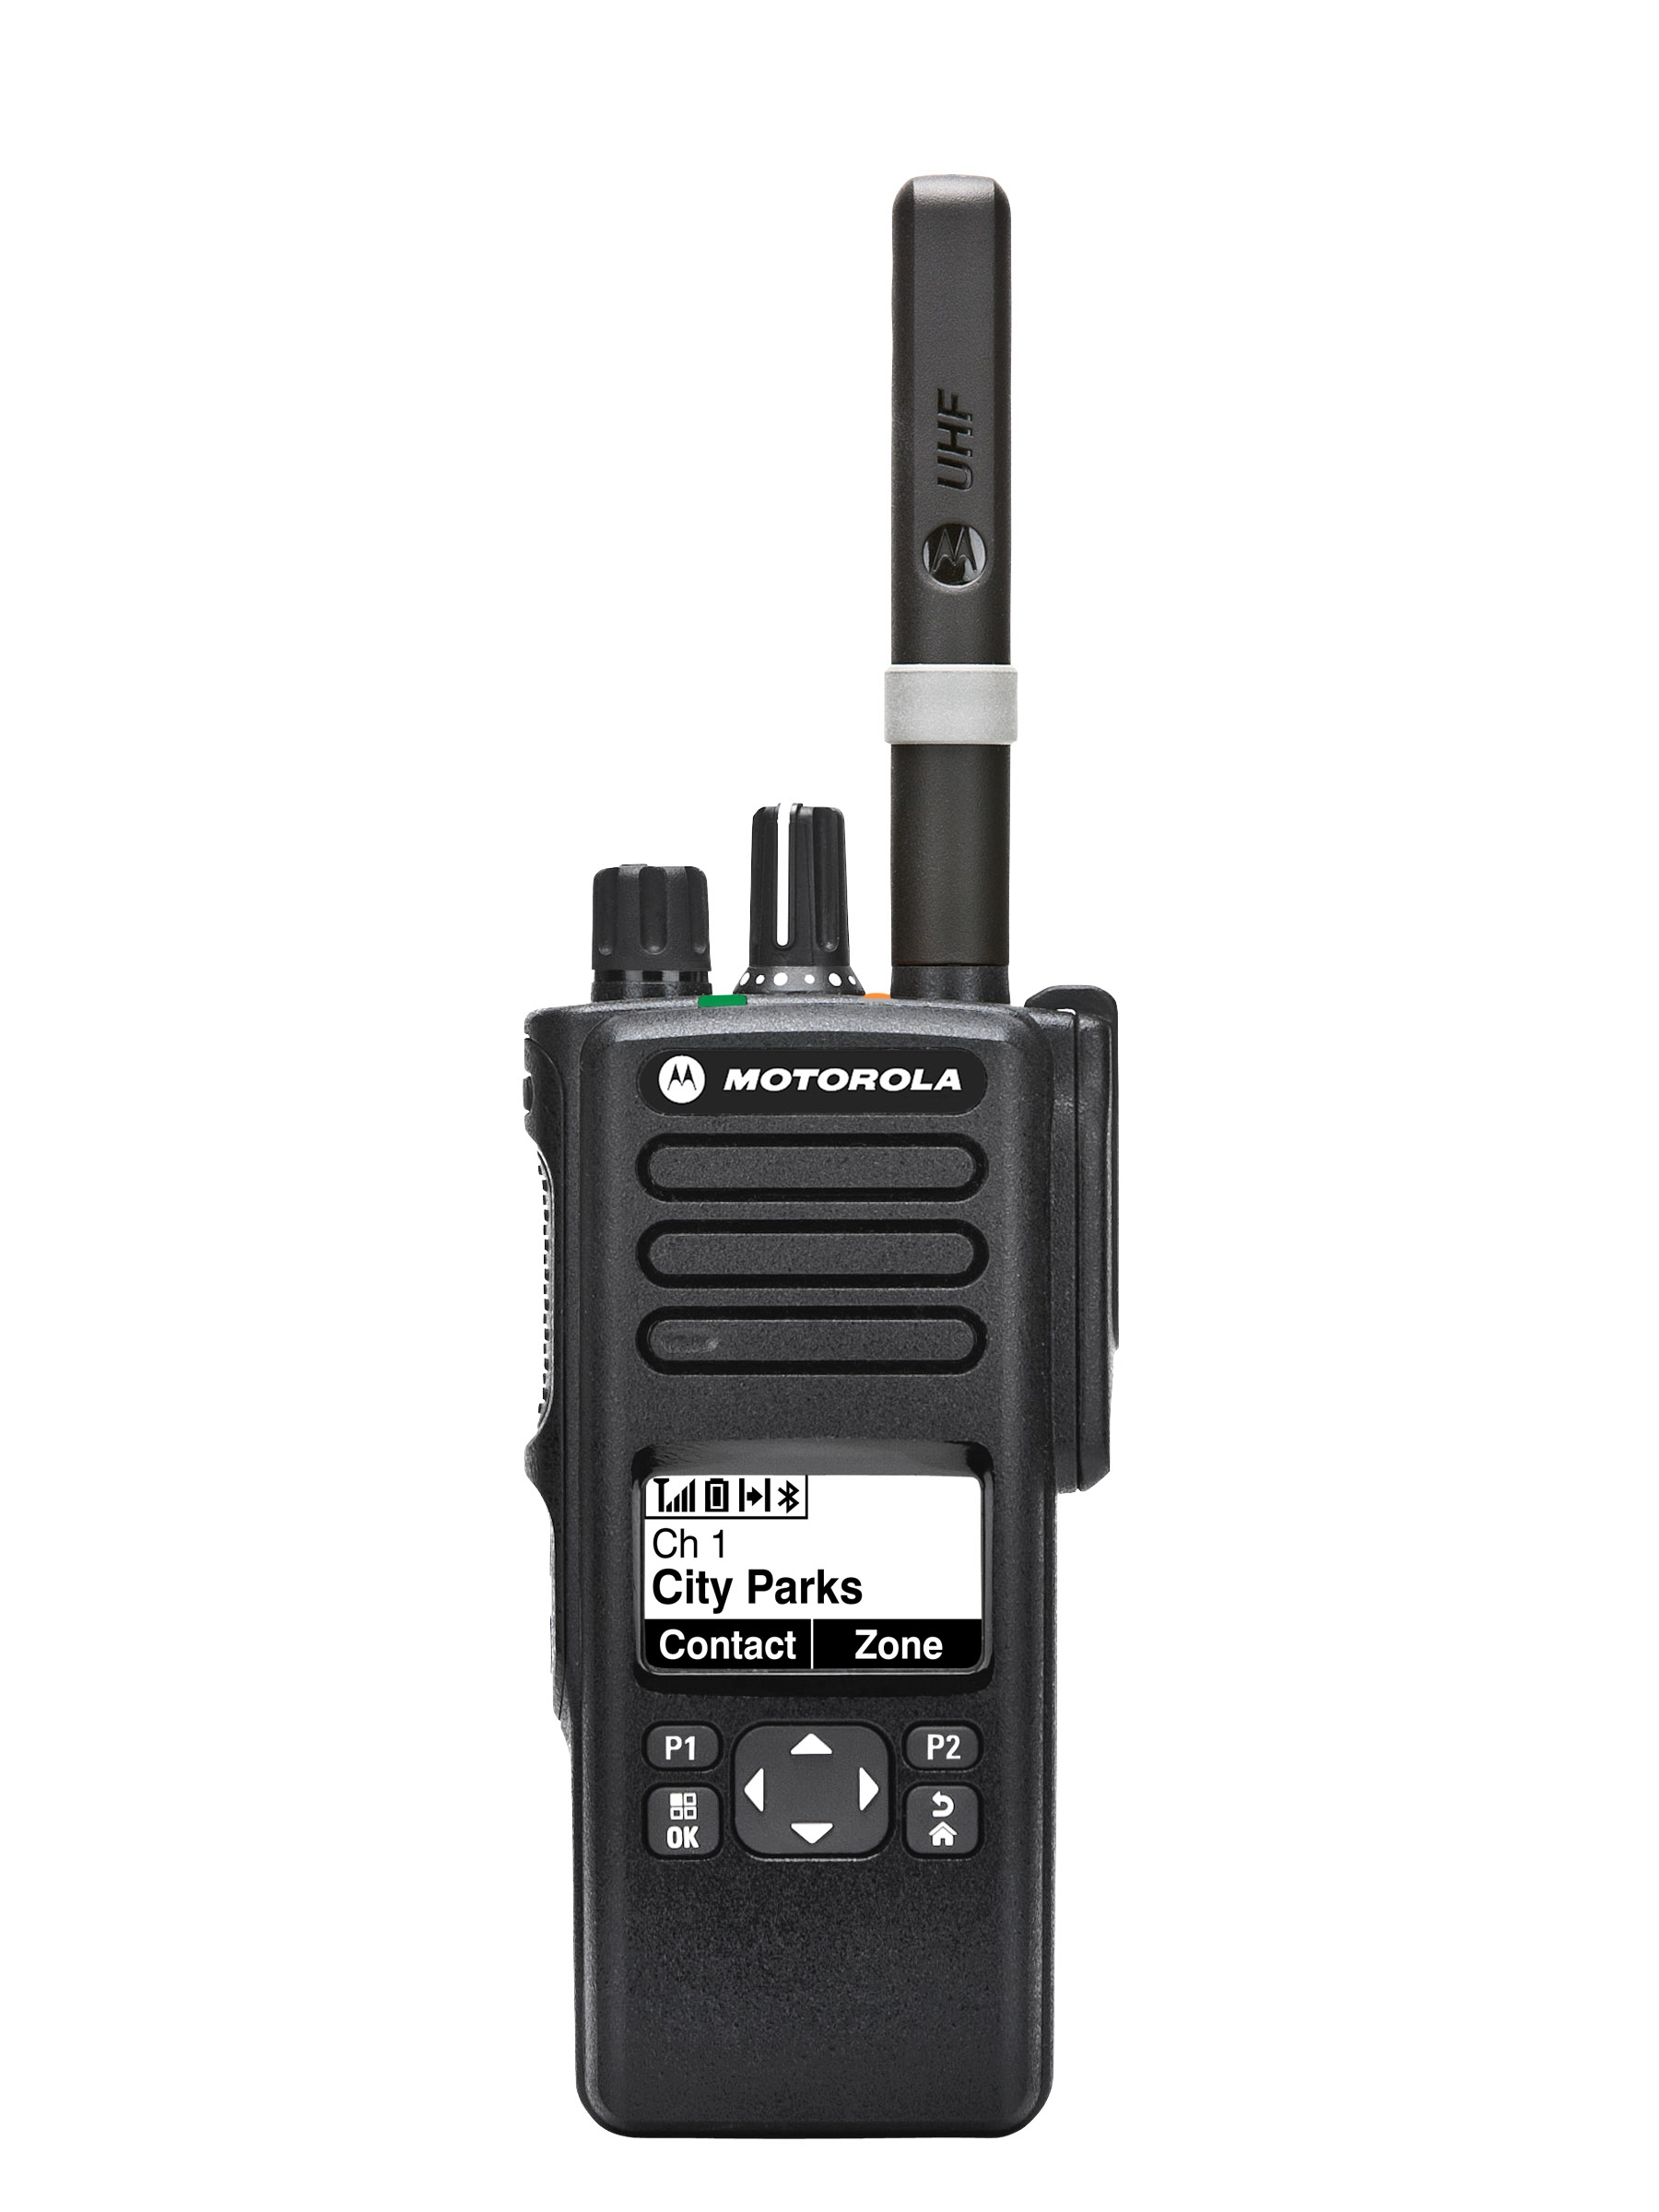 Motorola MOTOTRBO DP4600